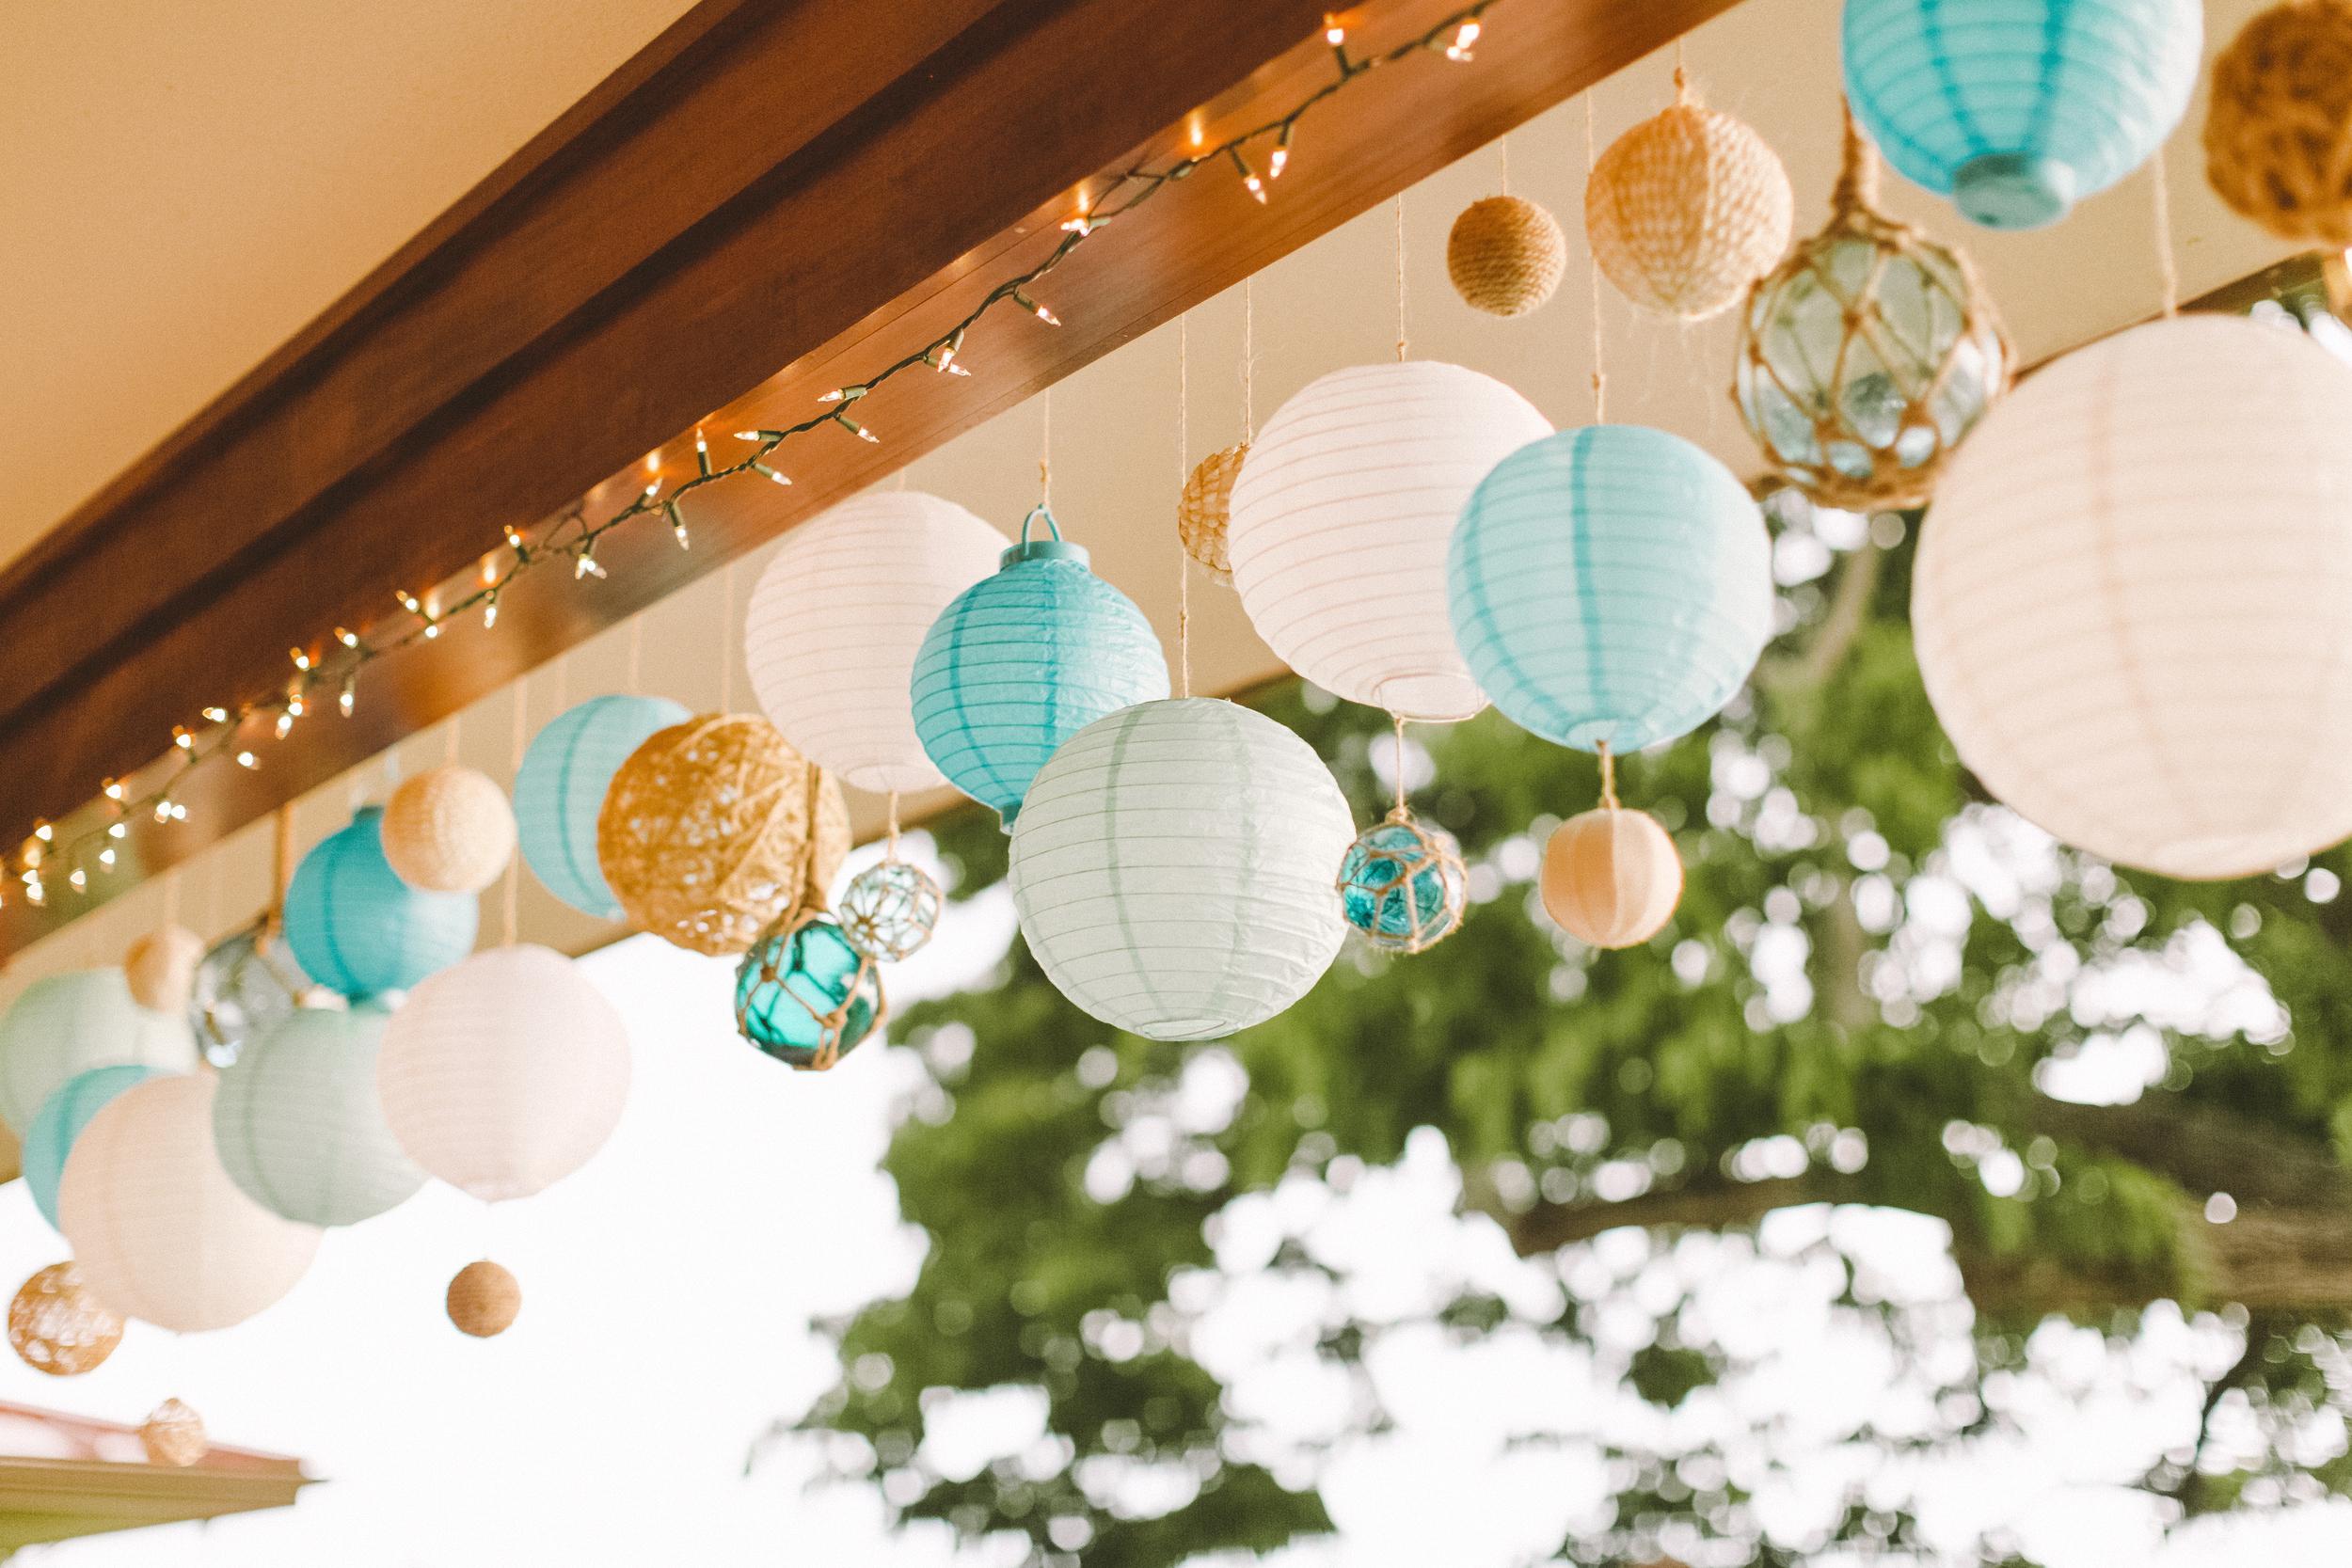 angie-diaz-photography-hawaii-wedding-photographer-kelli-jay-114.jpg